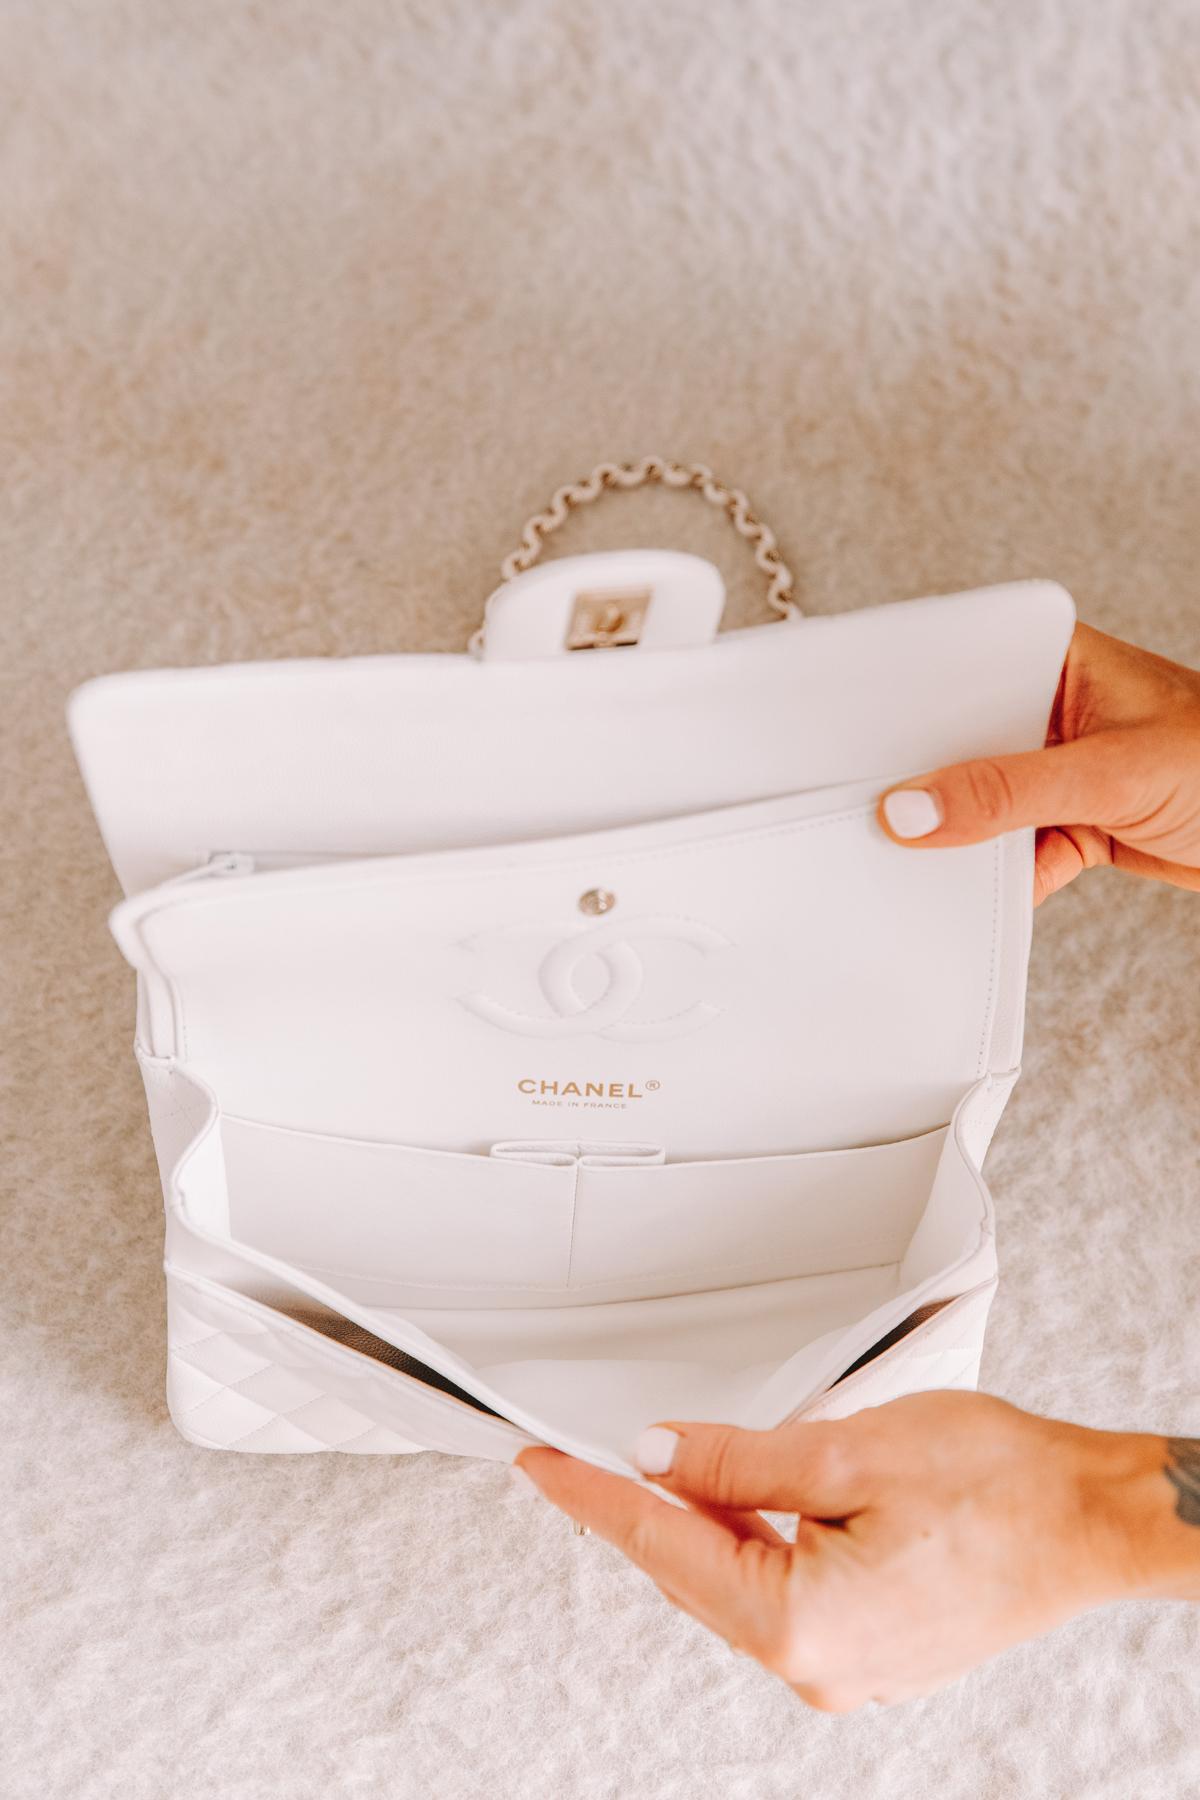 Fashion Jackson Chanel Classic Flap Medium White Handbag with Gold Hardware 2